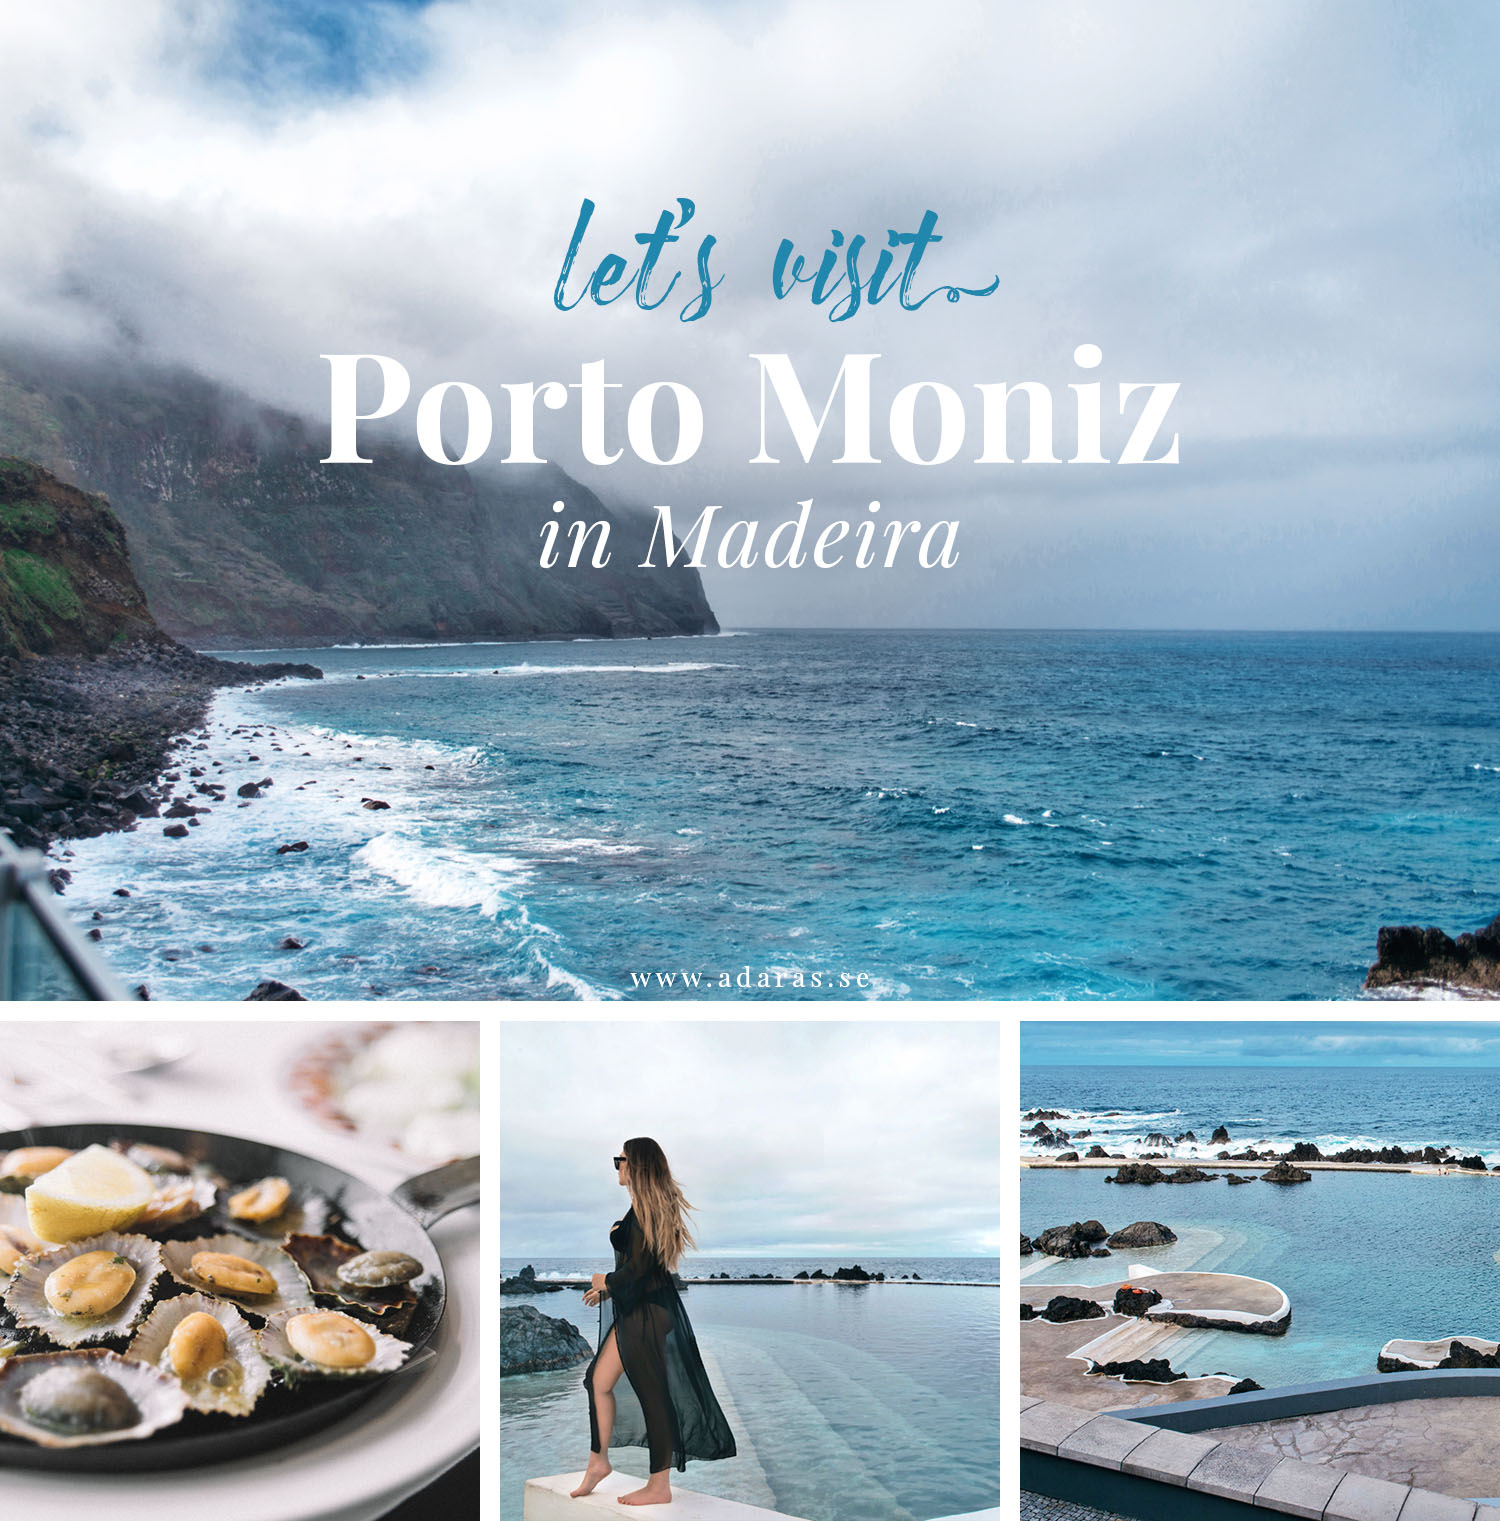 Guide to Porto Moniz in Madeira